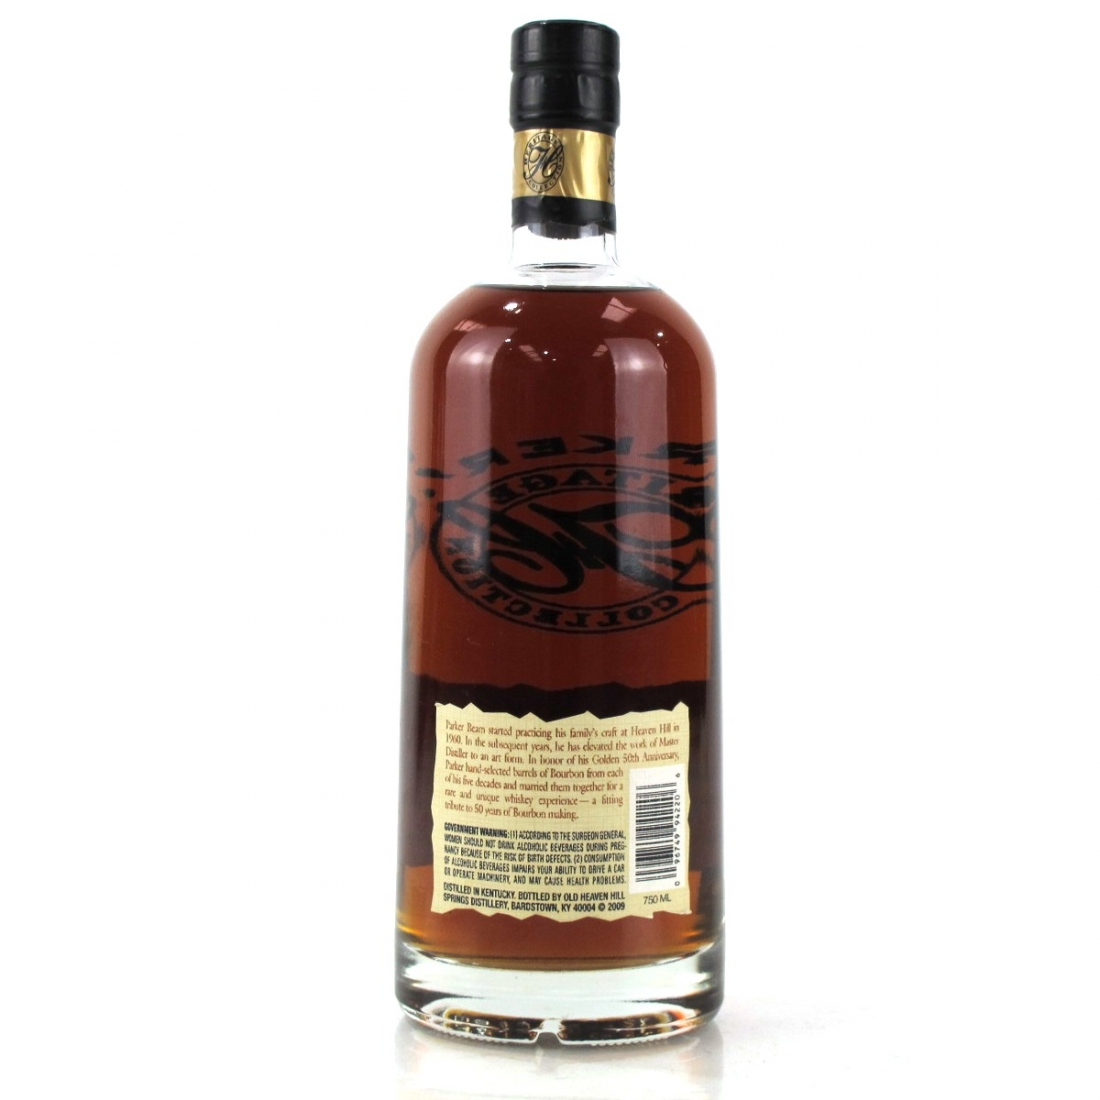 Parker's Heritage Collection Kentucky Straight Bourbon / Golden Anniversary